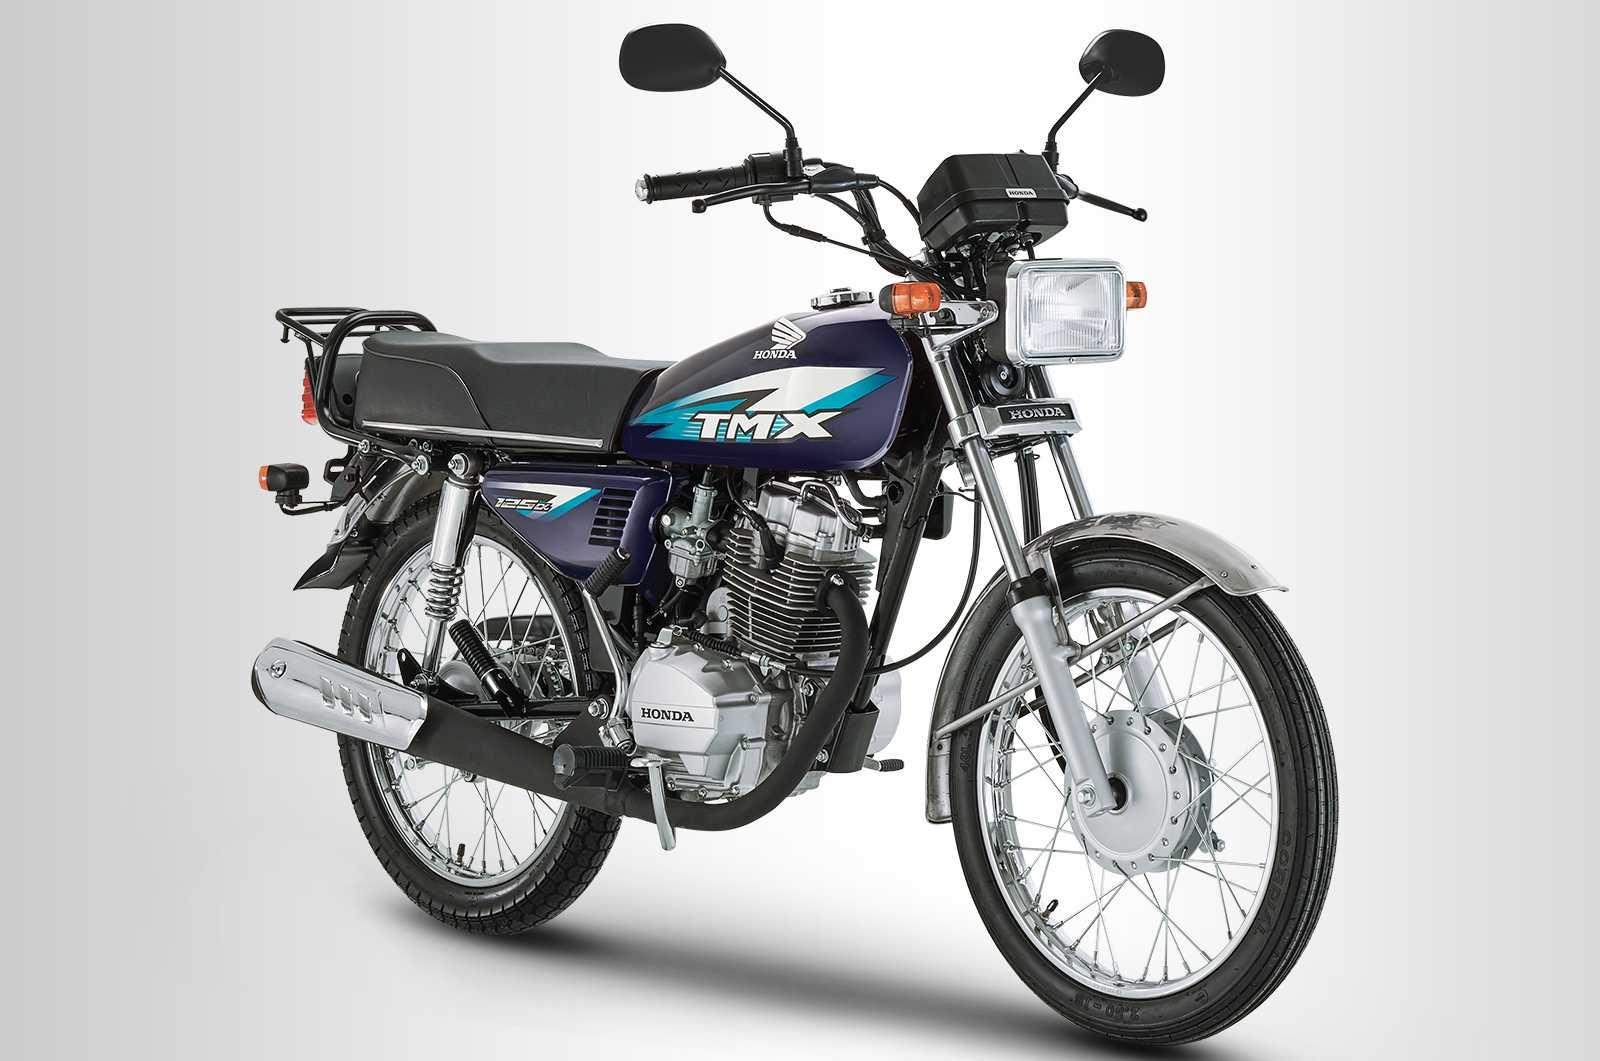 HONDA TMX 125 Alpha Euro 3